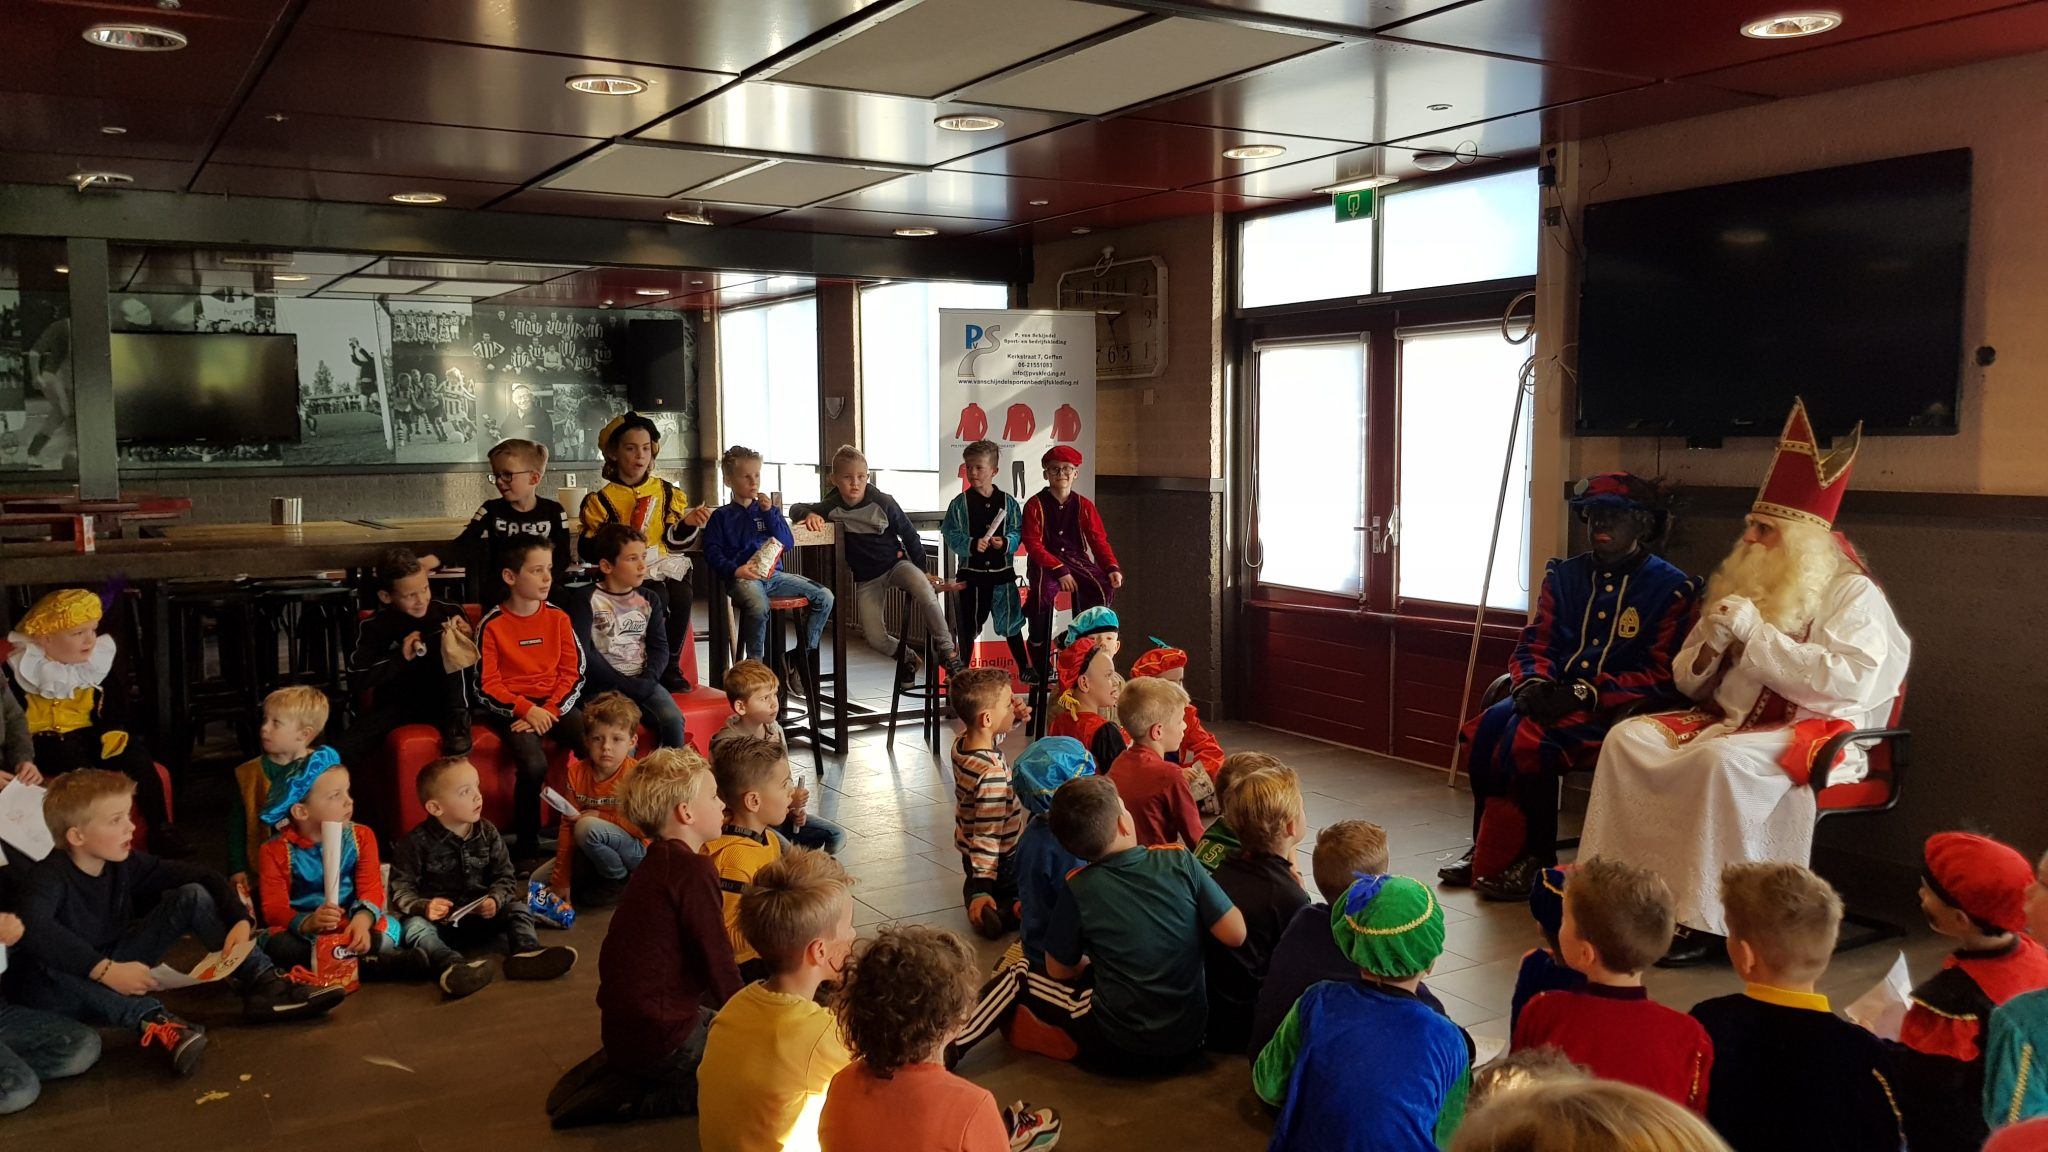 Fotoverslag: Sinterklaas bij Nooit Gedacht